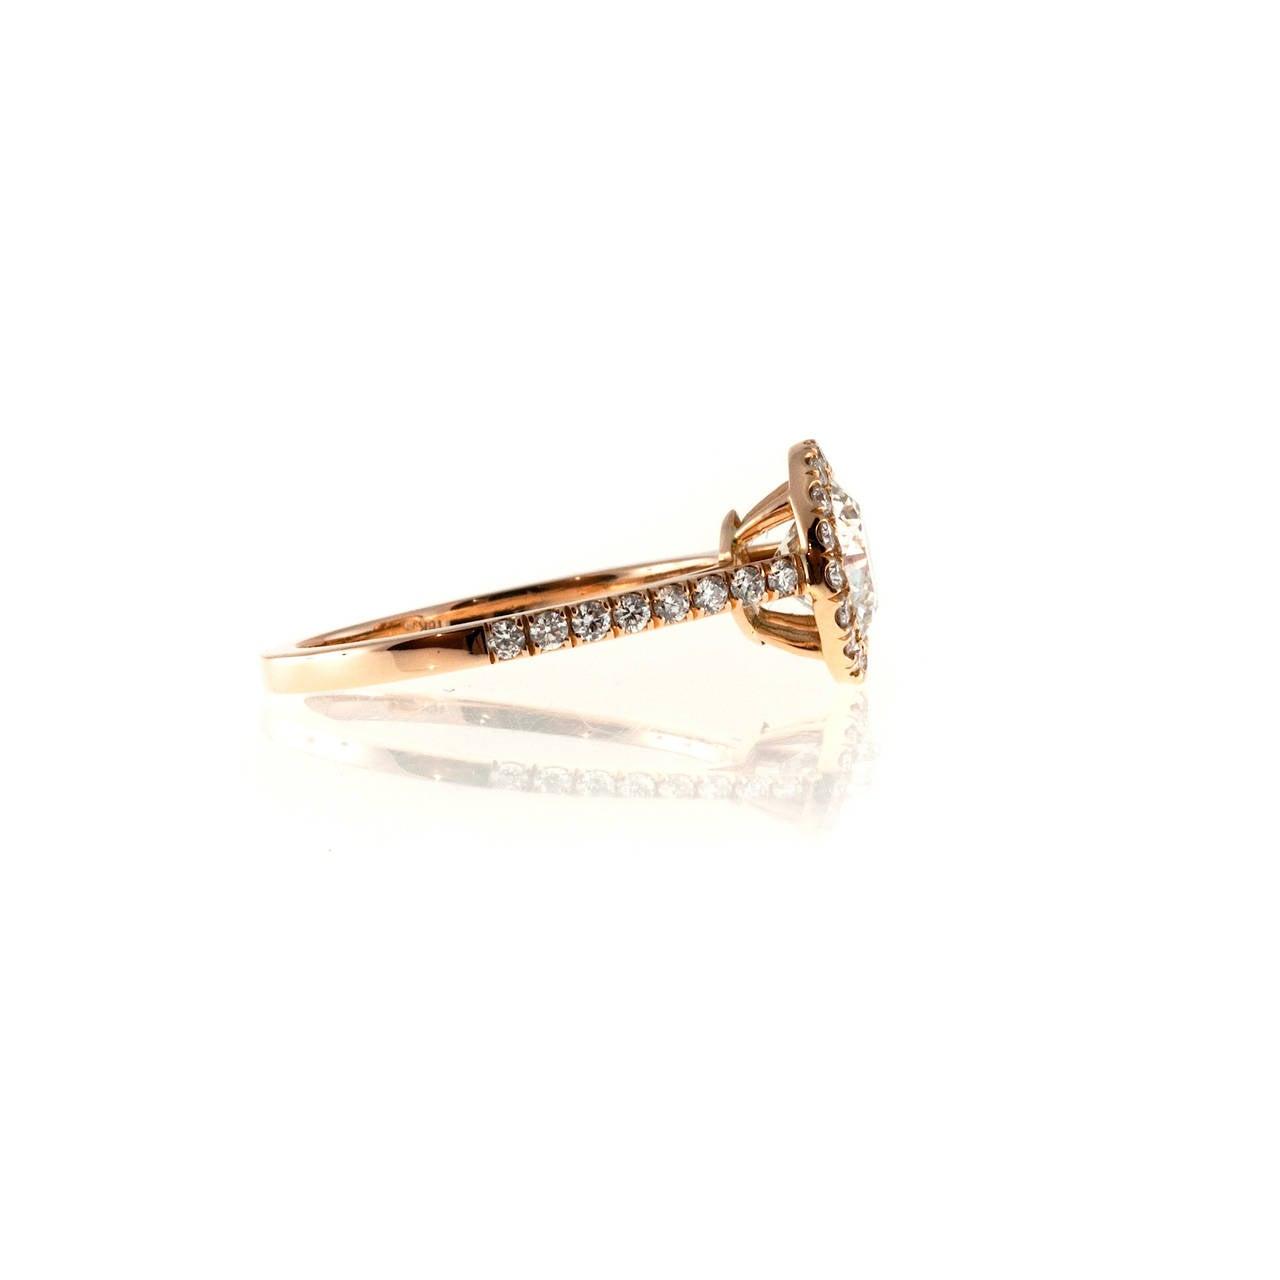 Peter Suchy GIA Certified 1.06 Carat Diamond Halo Rose Gold Engagement Ring 4